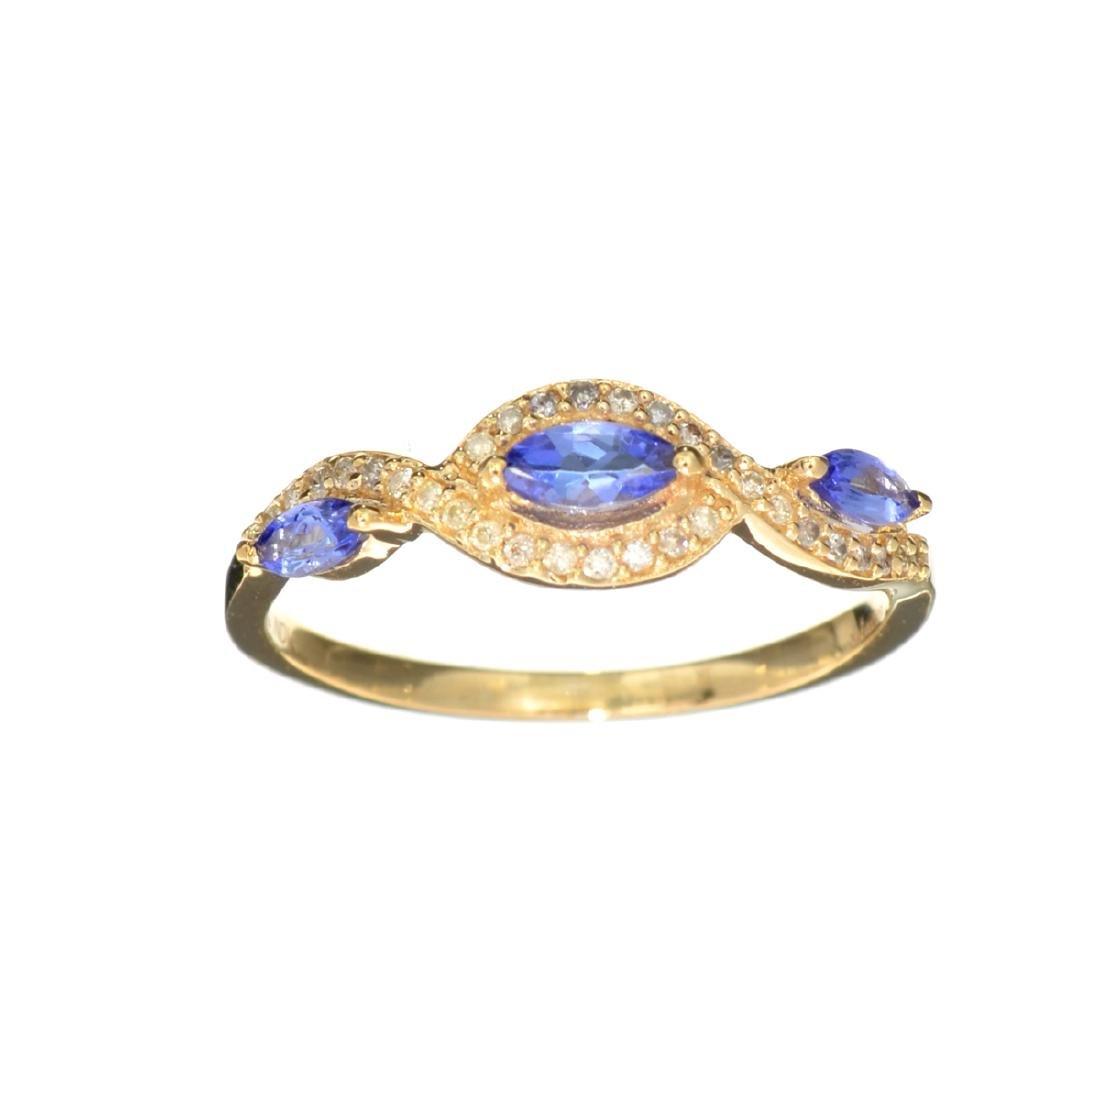 Designer Sebastian 14KT Gold Marquise Cut Tanzanite and